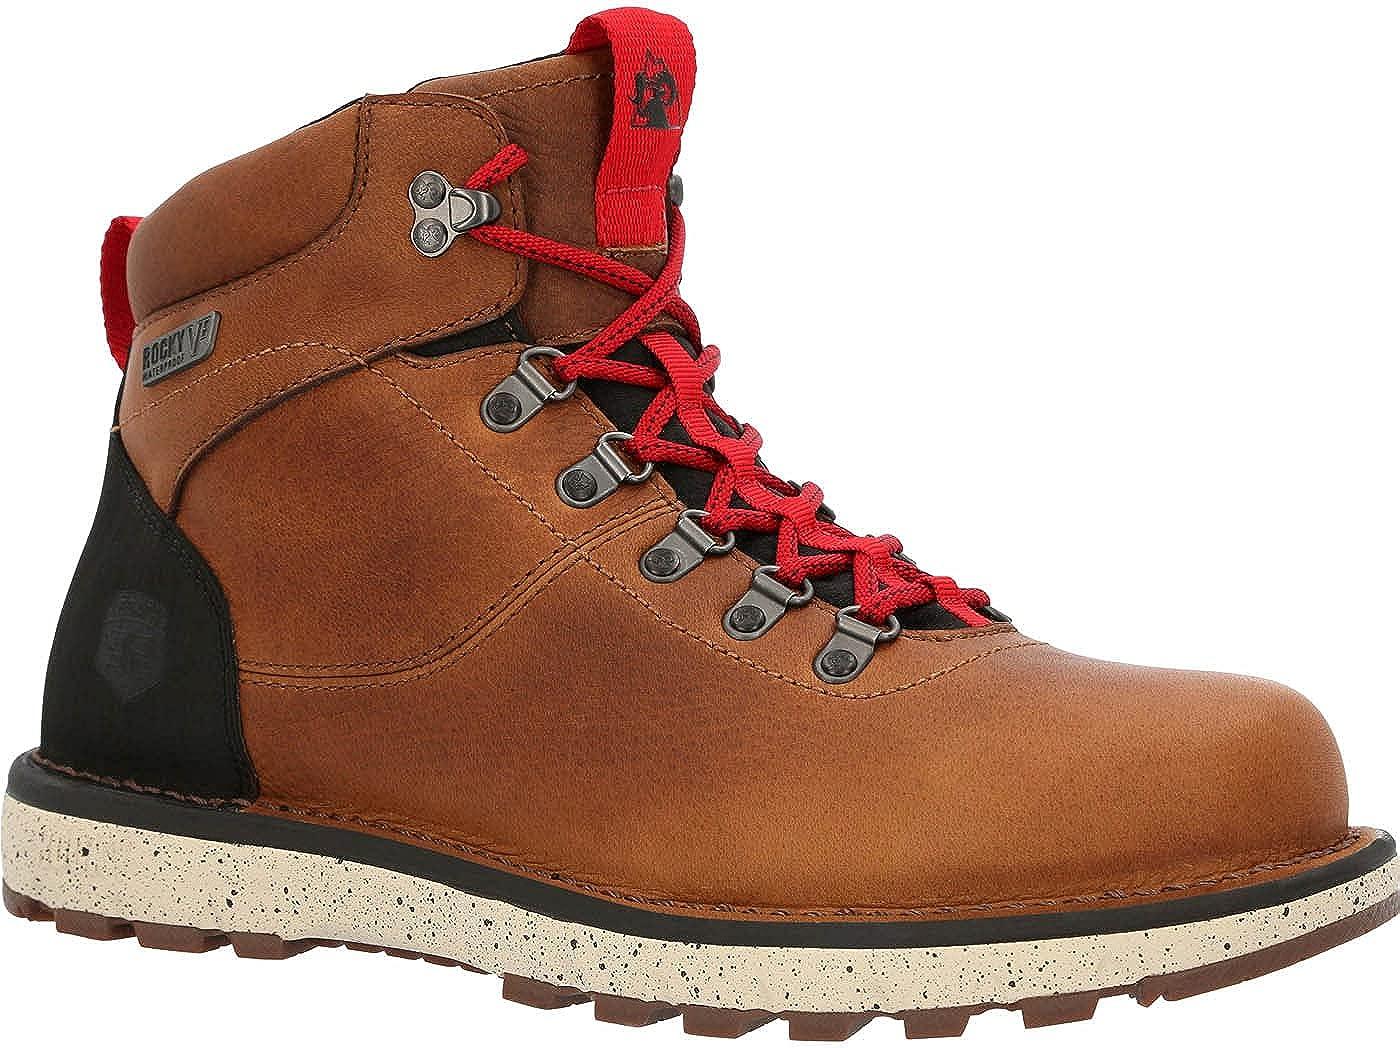 Elegant Rocky Legacy 32 Dedication Waterproof Hiking W 10 Size Boot